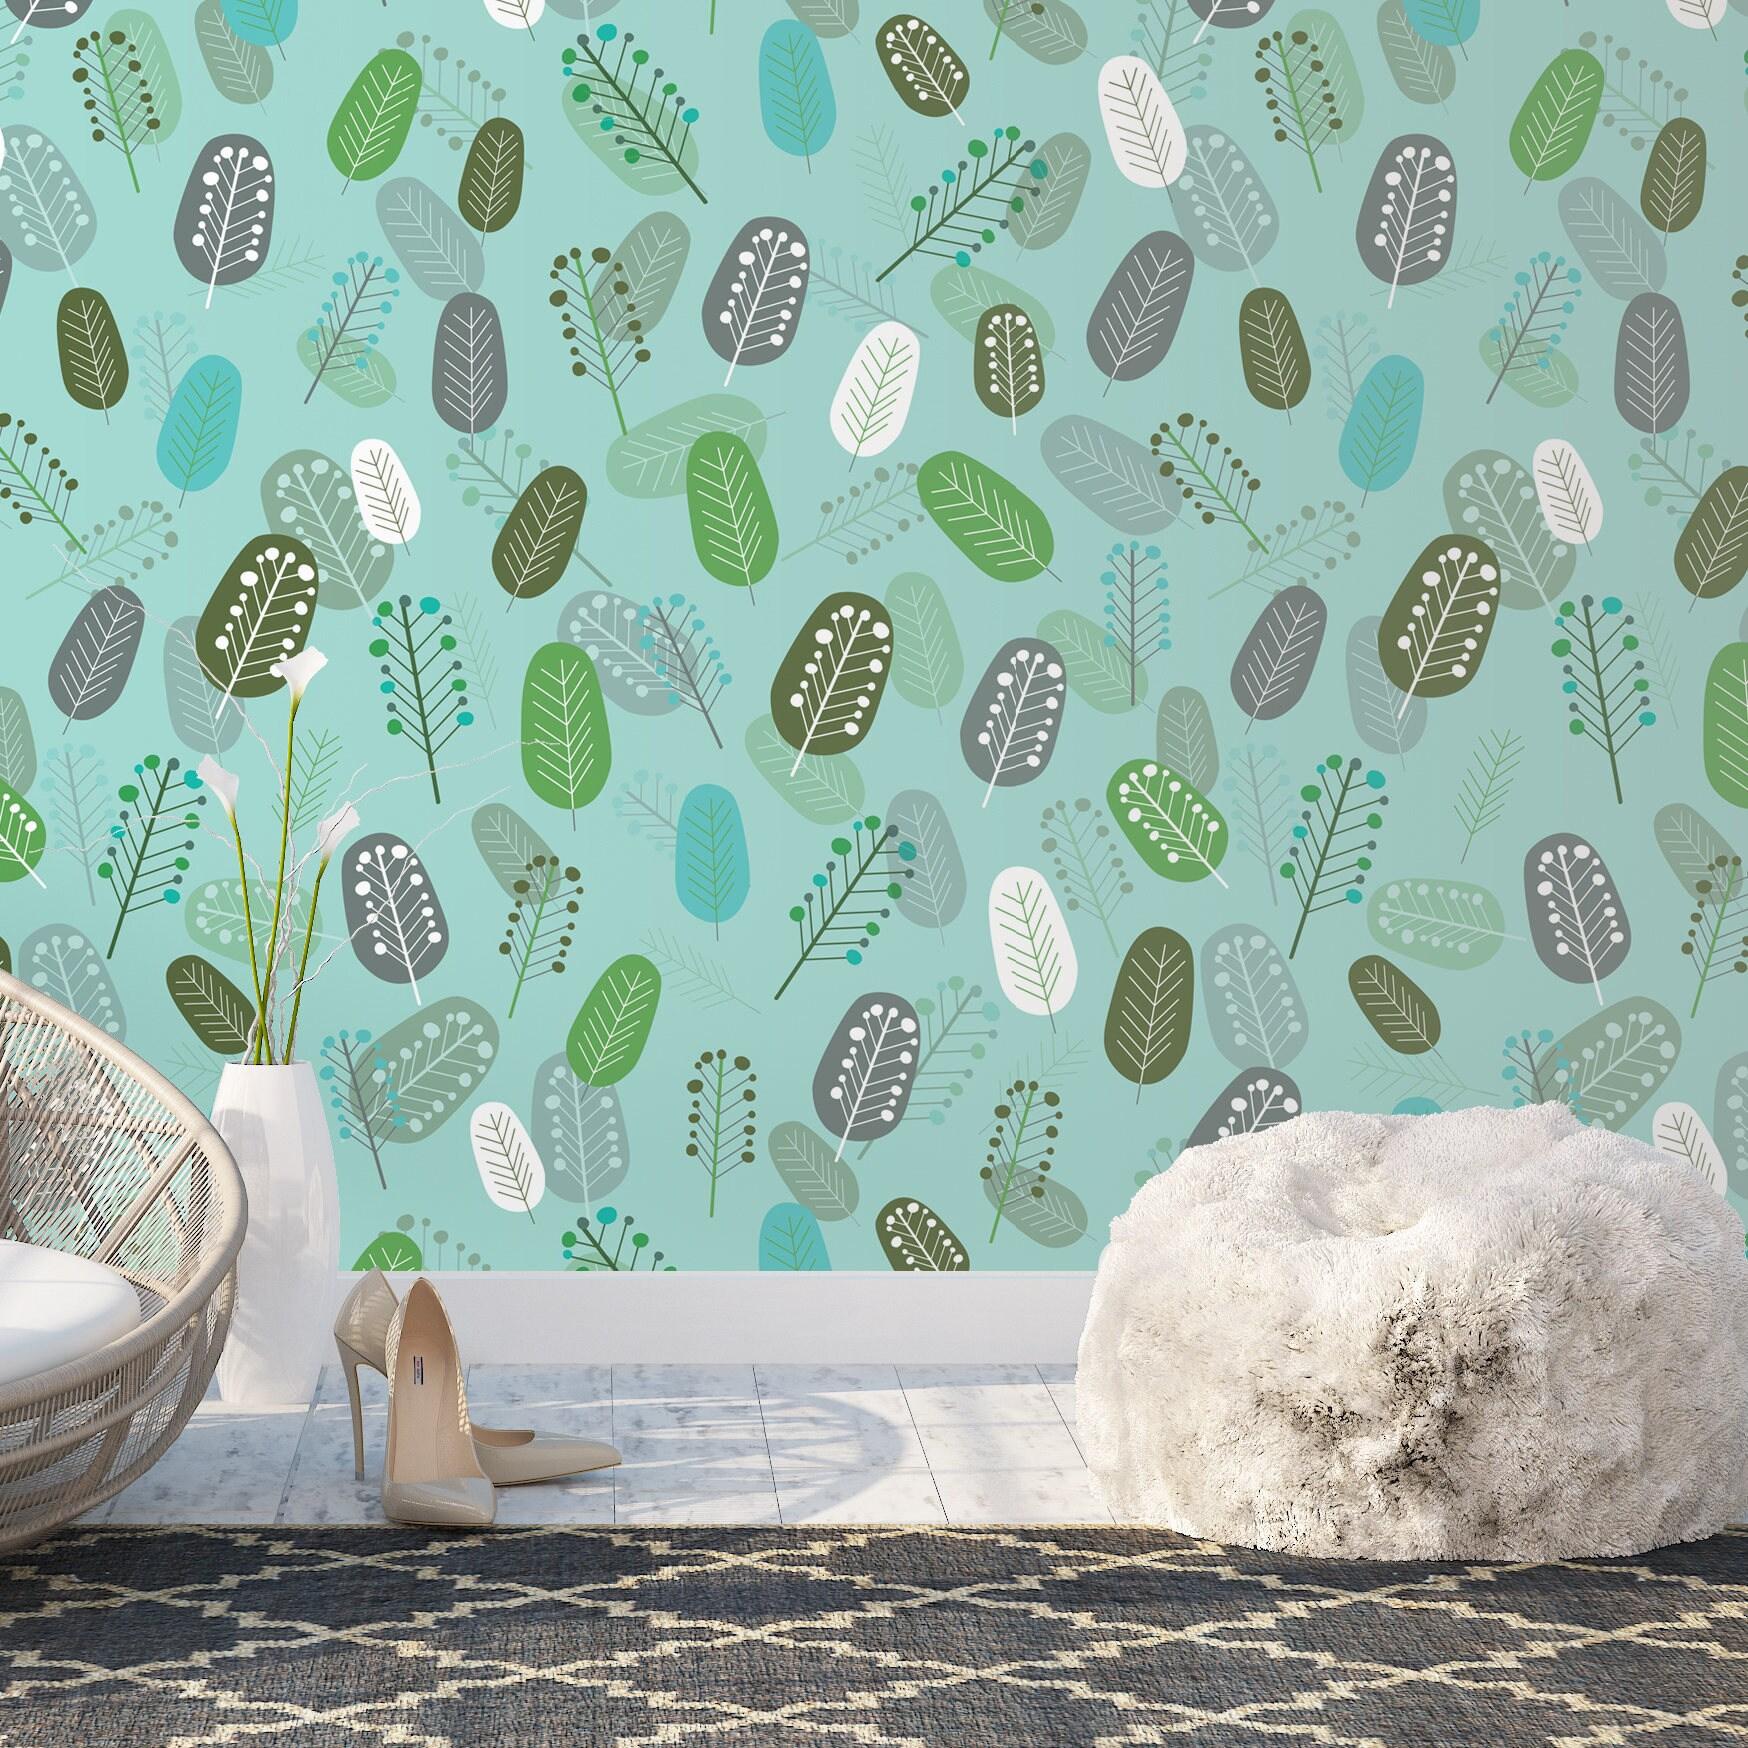 Removable Wallpaper Geometric Leaves Wallpaper Fall Etsy